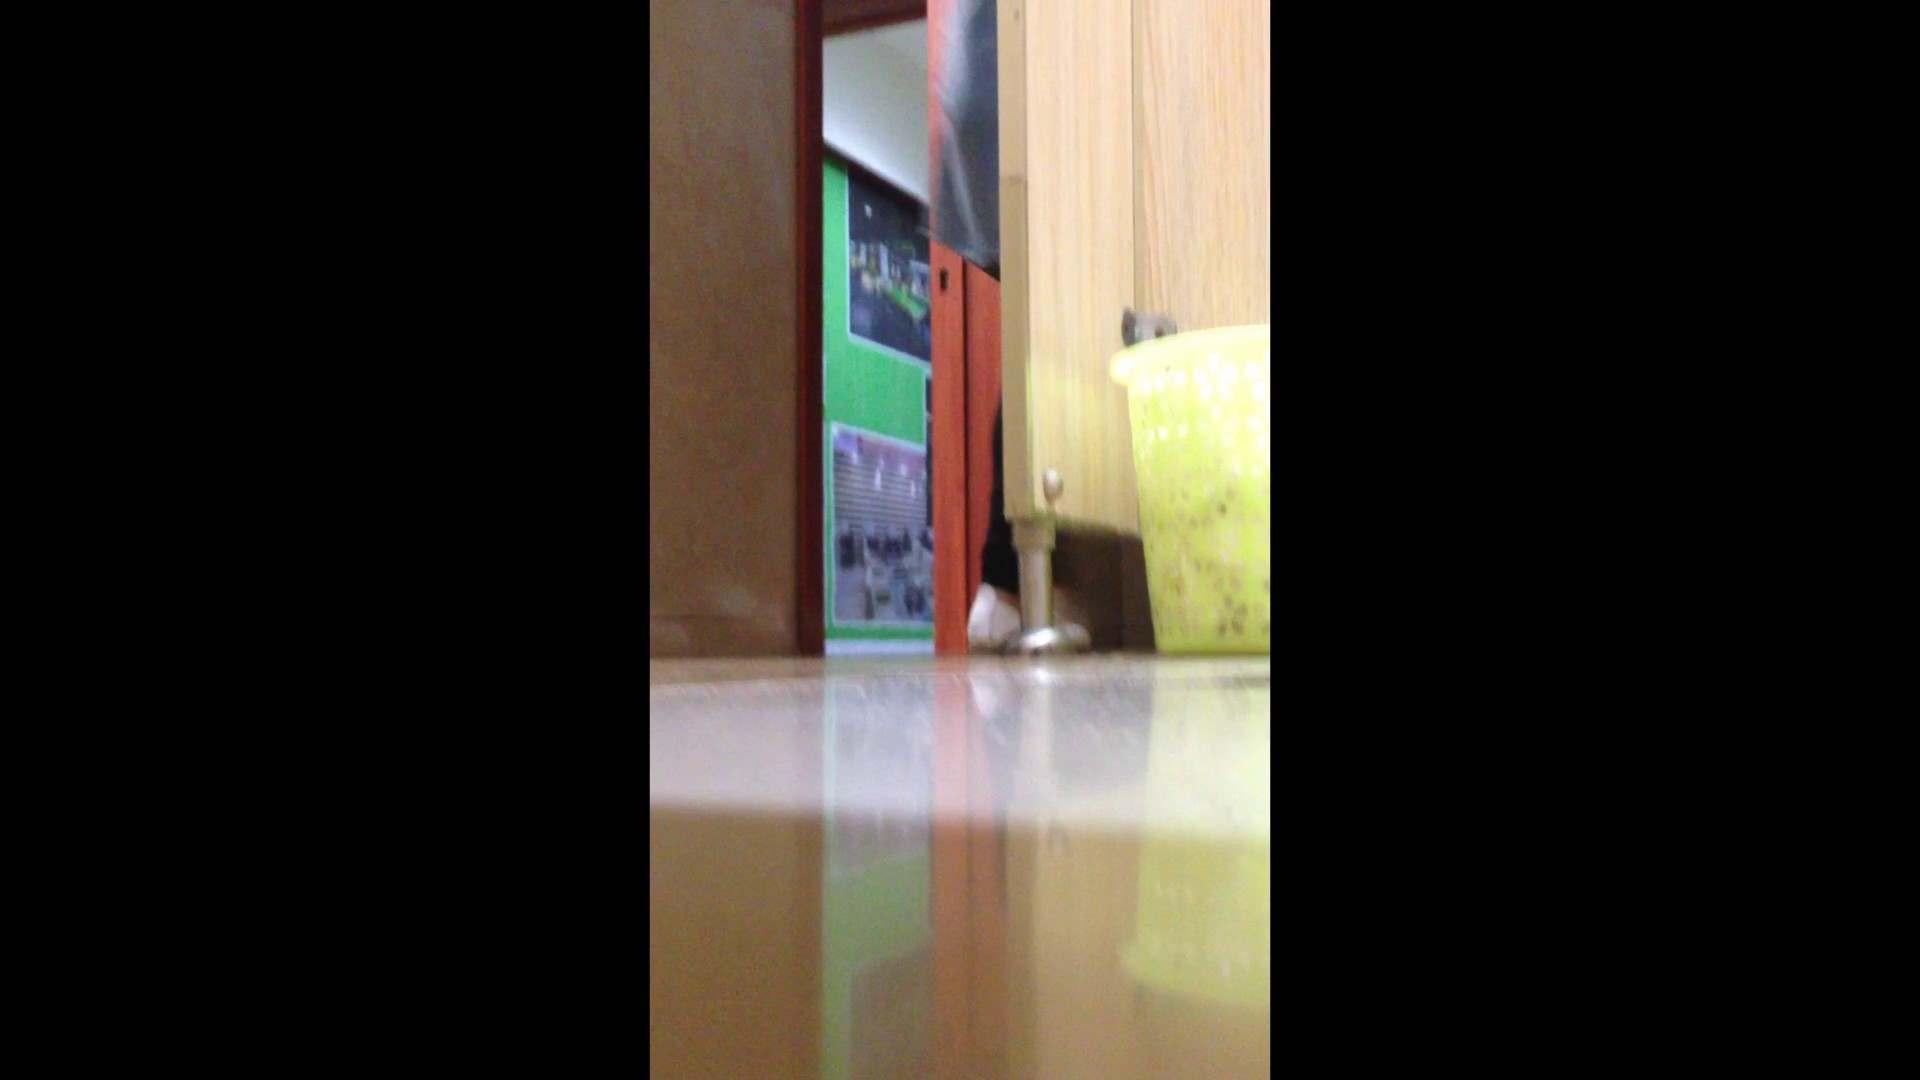 芸術大学ガチ潜入盗撮 JD盗撮 美女の洗面所の秘密 Vol.87 美女 戯れ無修正画像 79枚 69